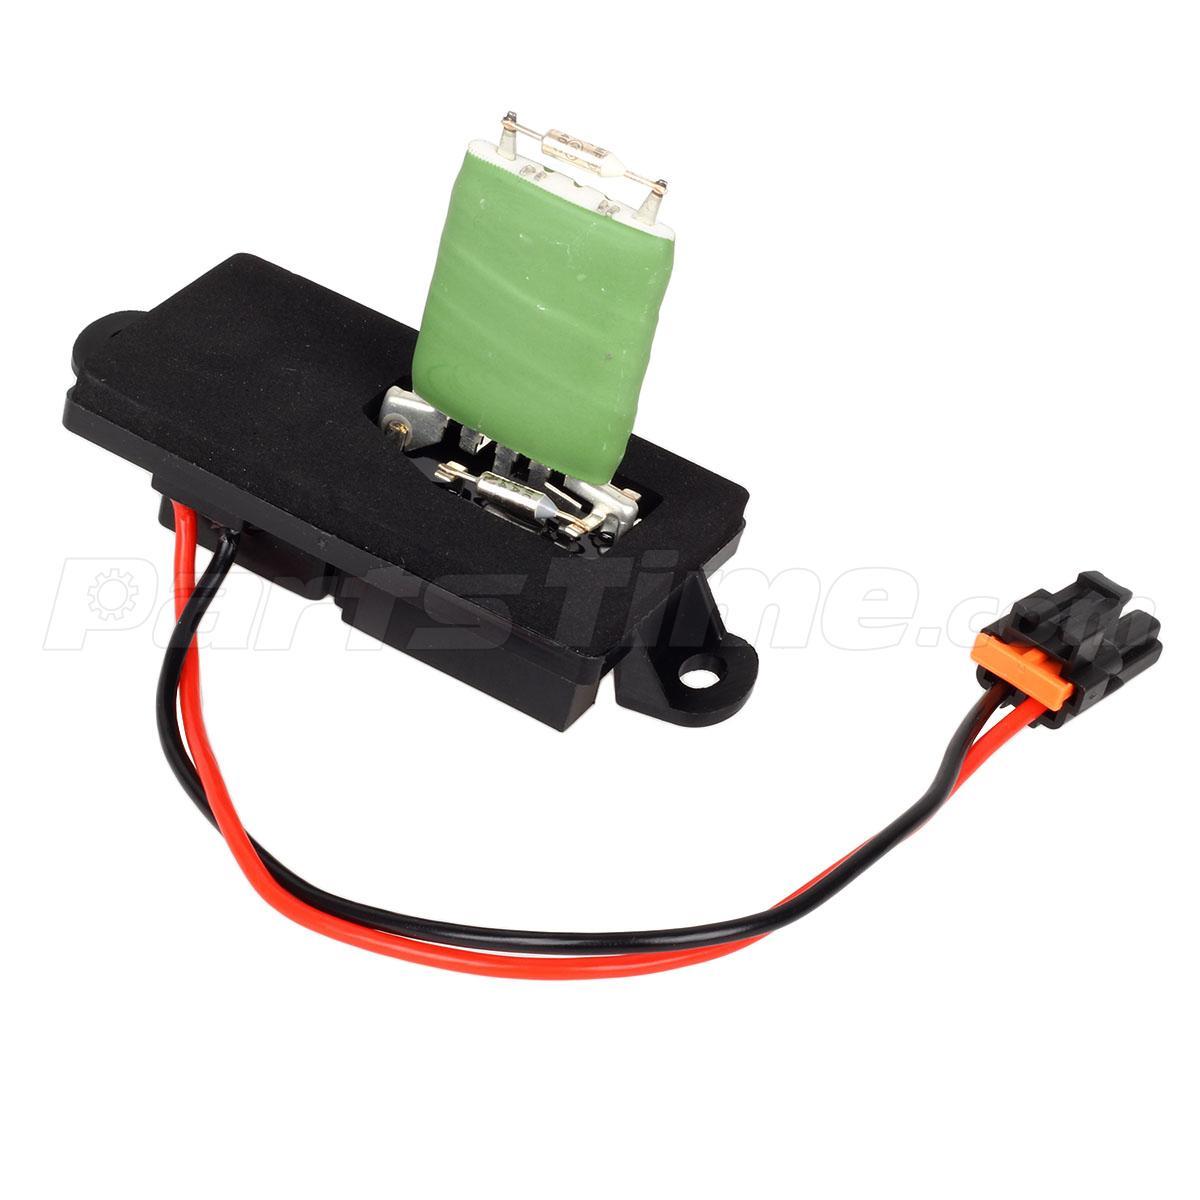 on 15305077 Blower Motor Resistor